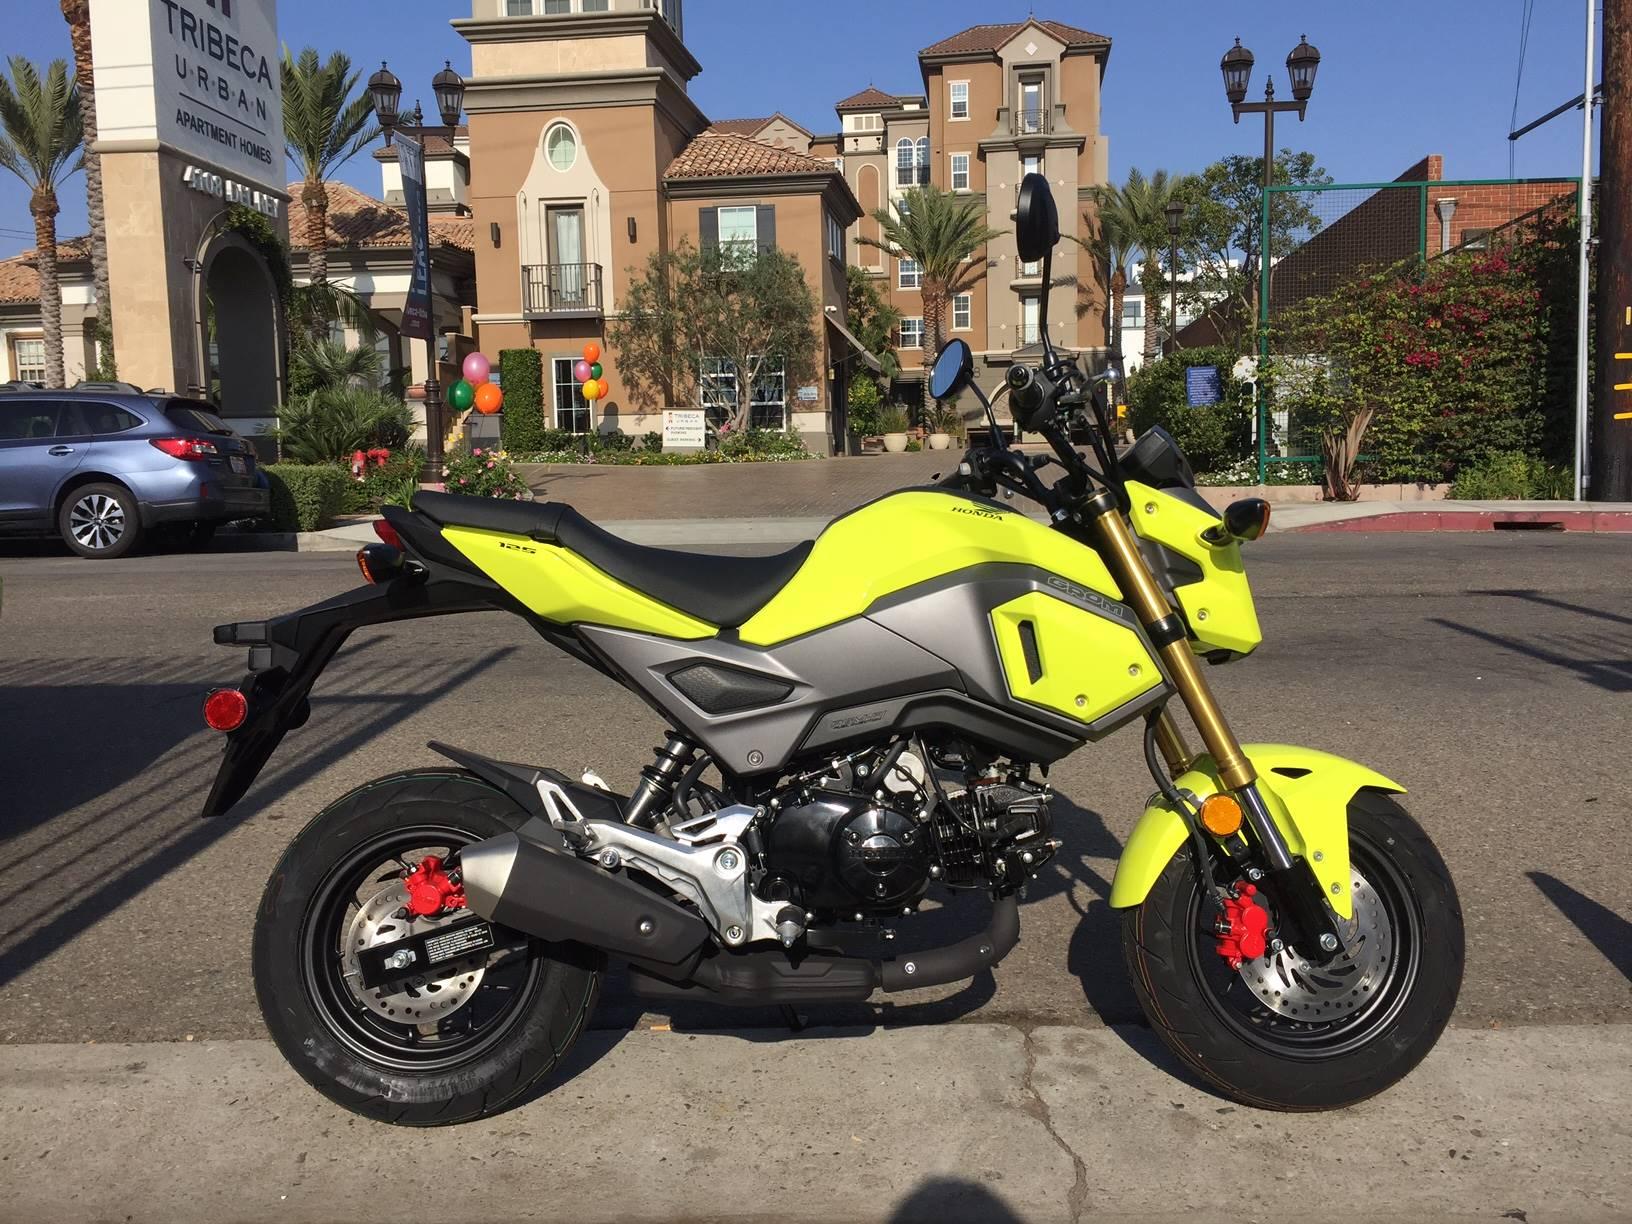 2018 Honda Grom Motorcycles Marina Del Rey California